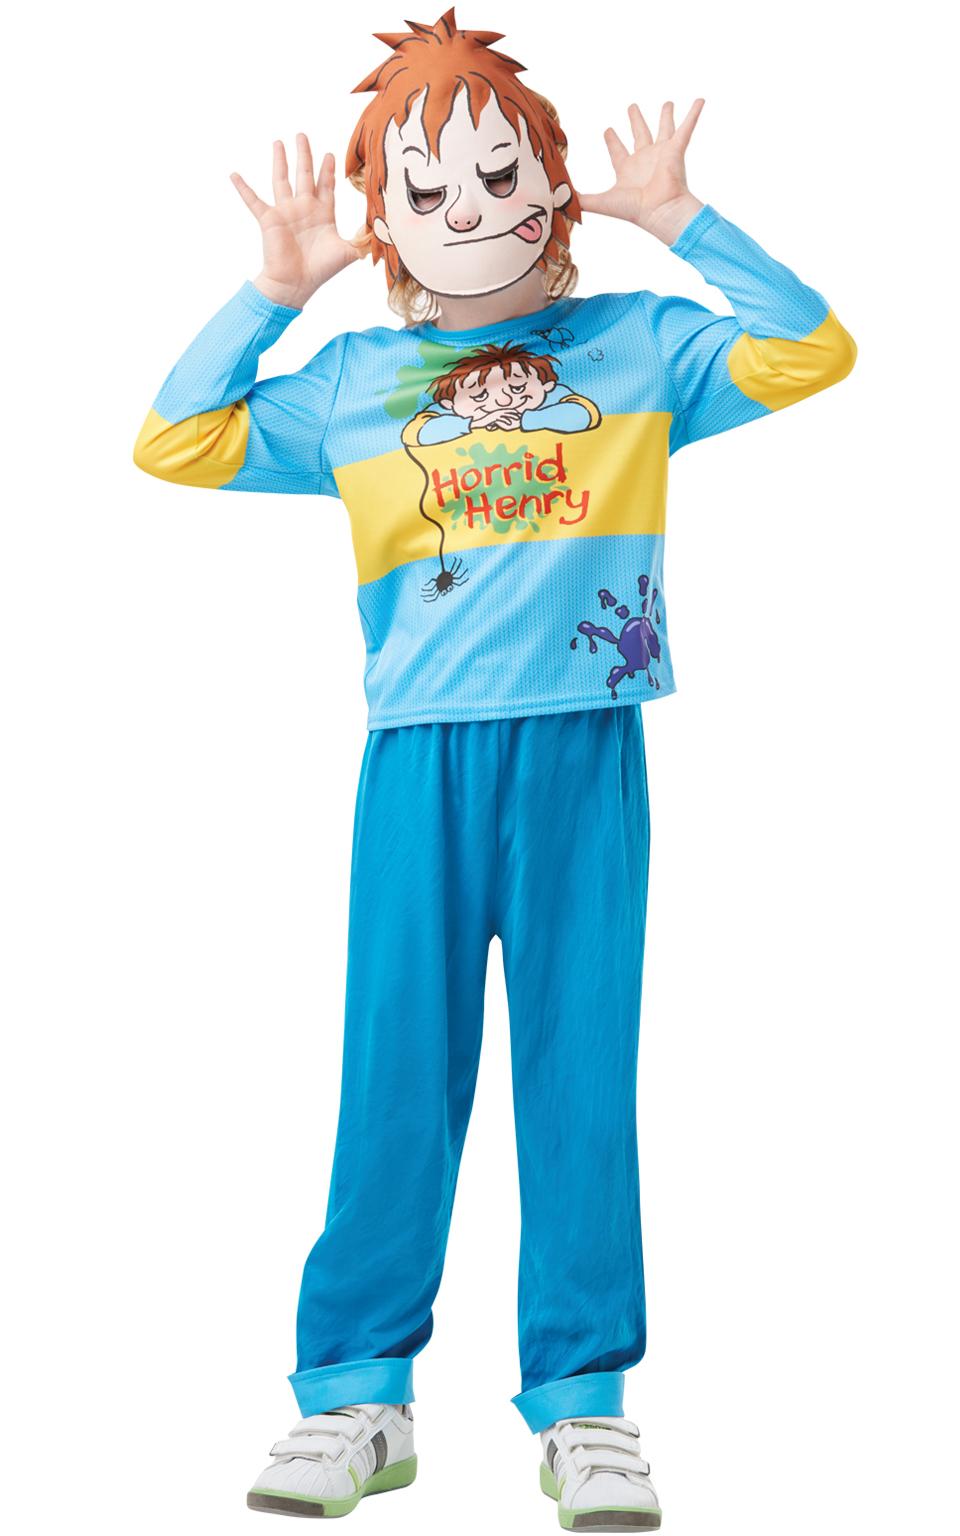 Boys Horrid Henry Costume Kids School Book Week Story Fancy Dress Outfit